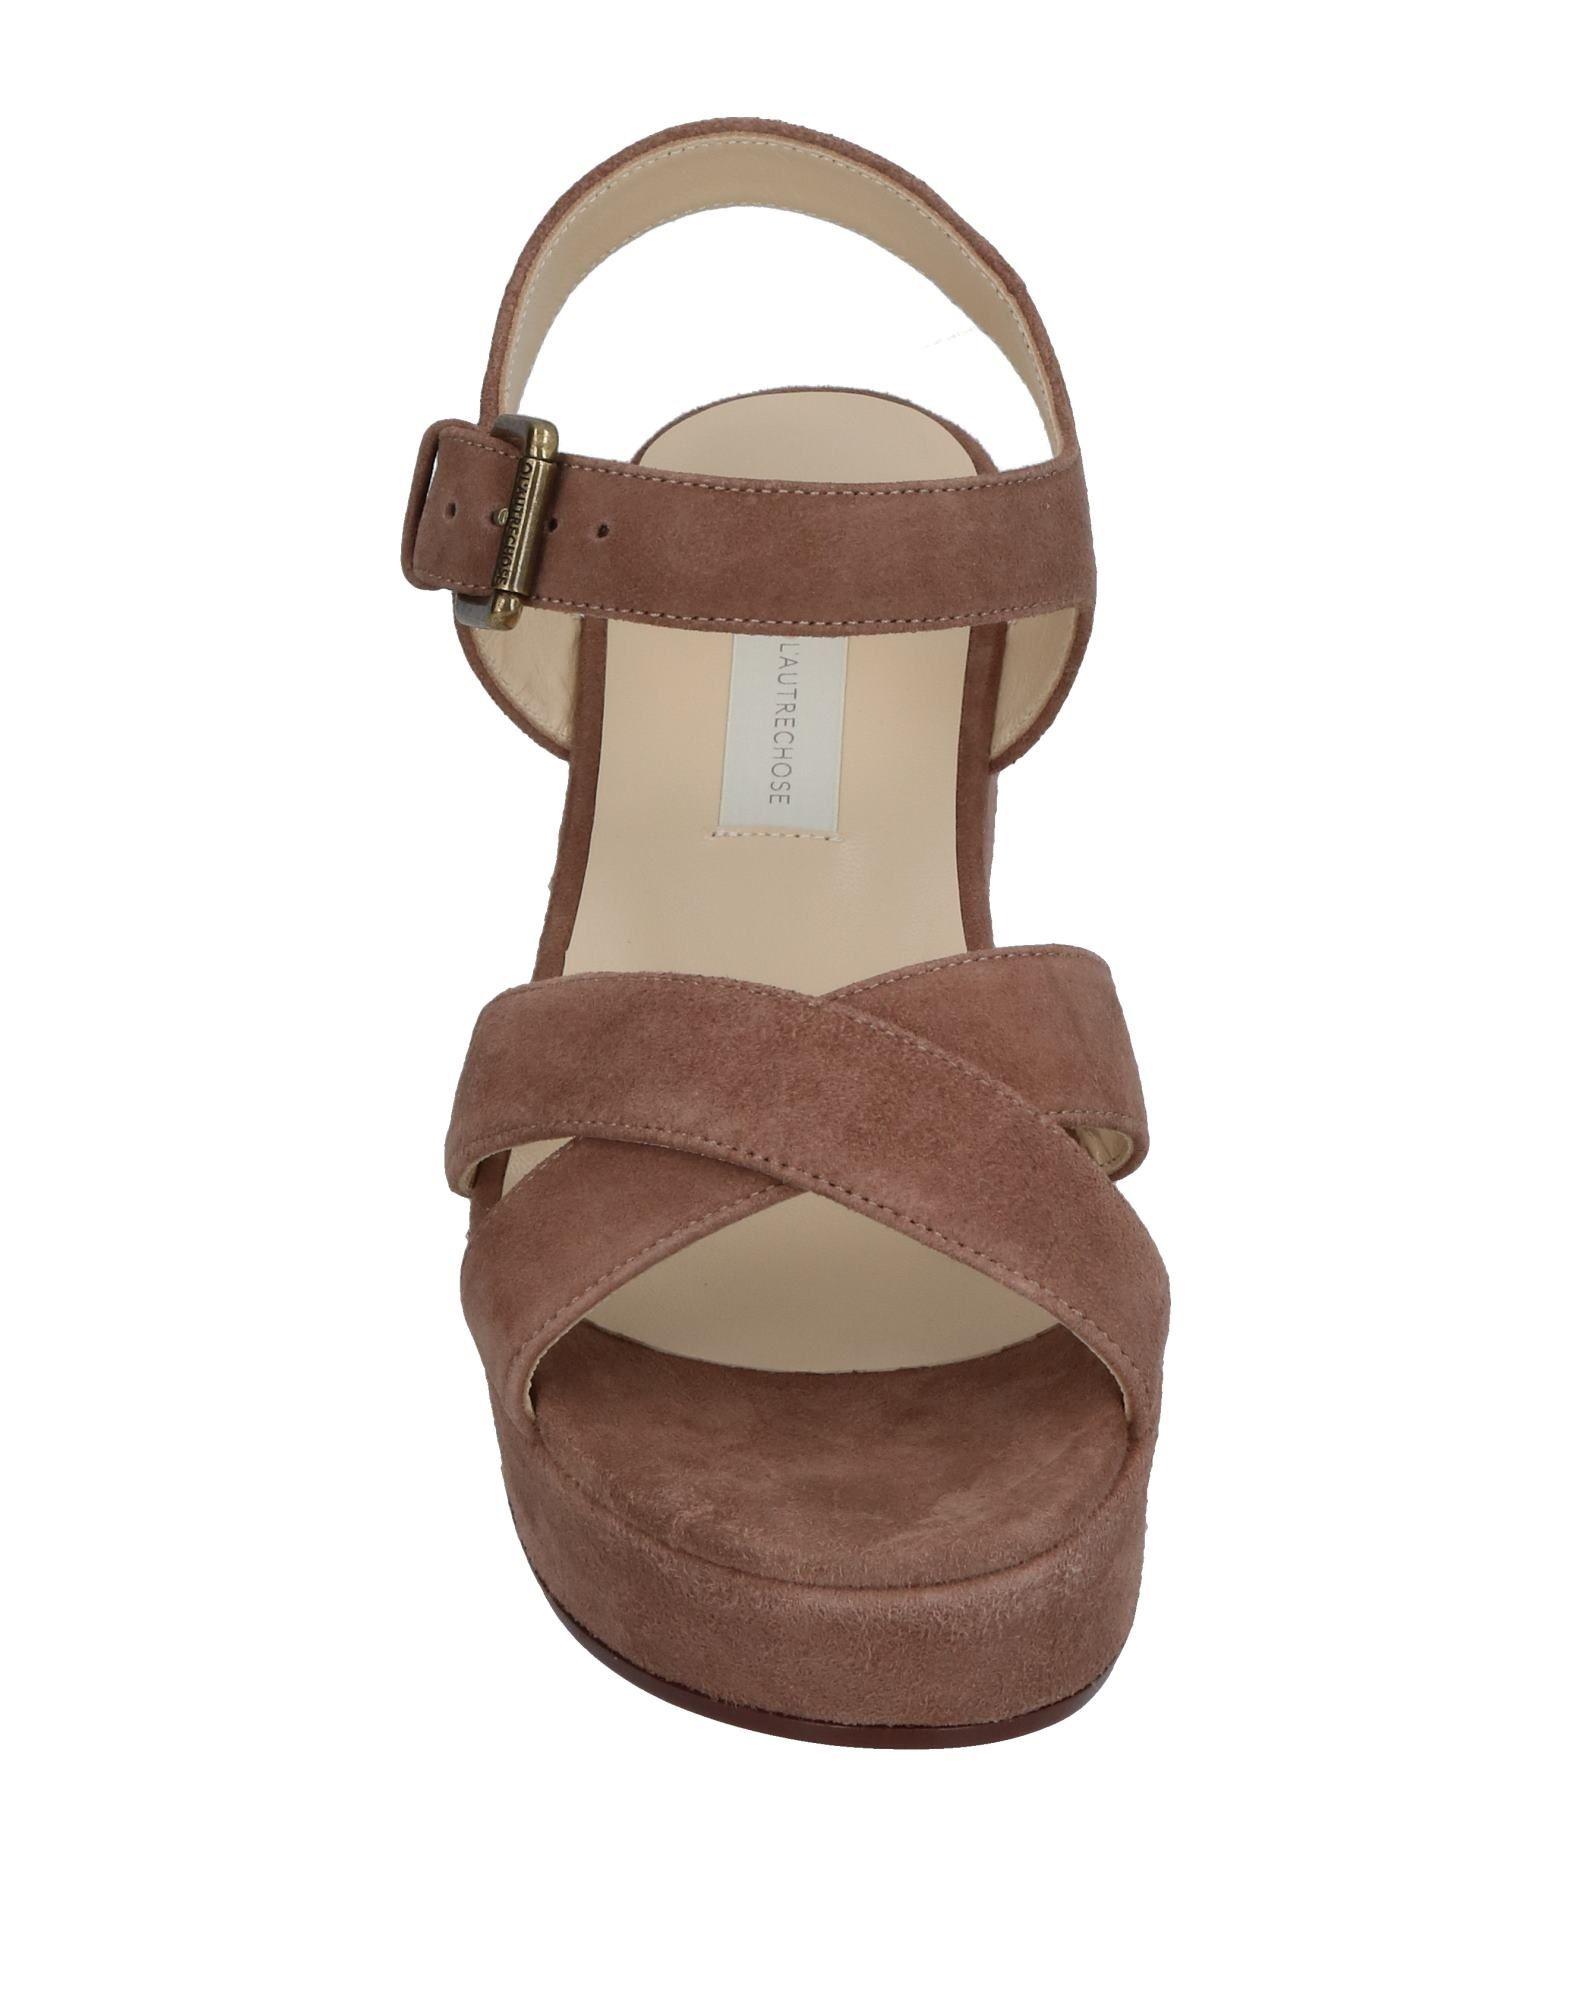 Stilvolle billige Schuhe L' Autre Chose Sandalen Sandalen Sandalen Damen  11380897JA 13e0cf